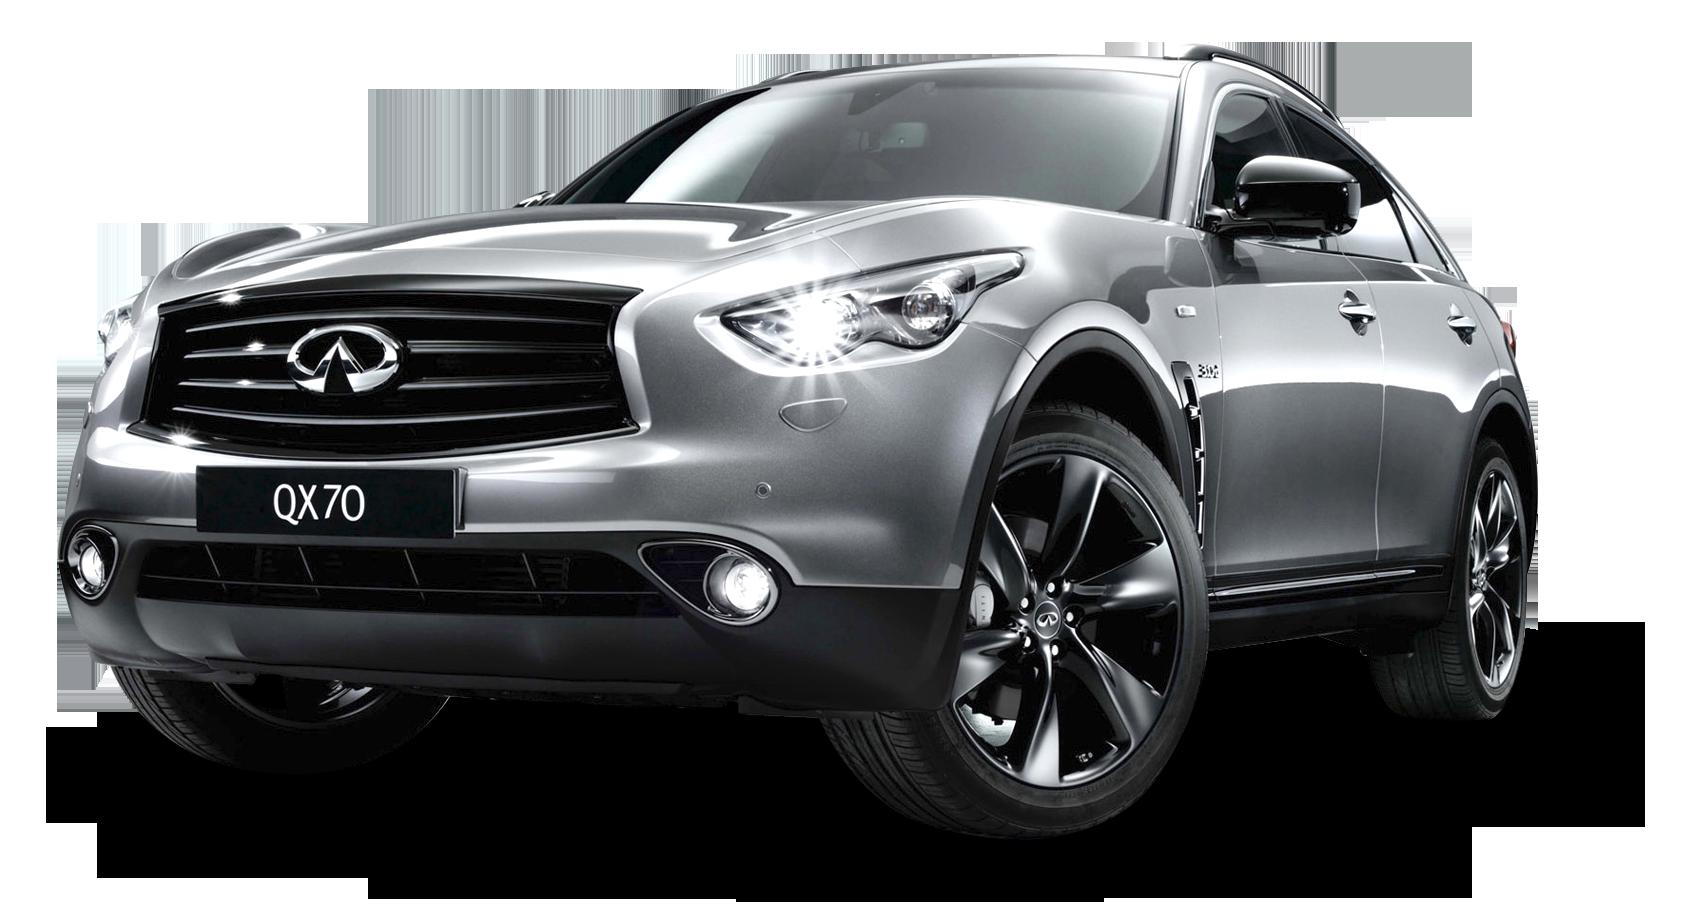 Infiniti QX70S Silver Car